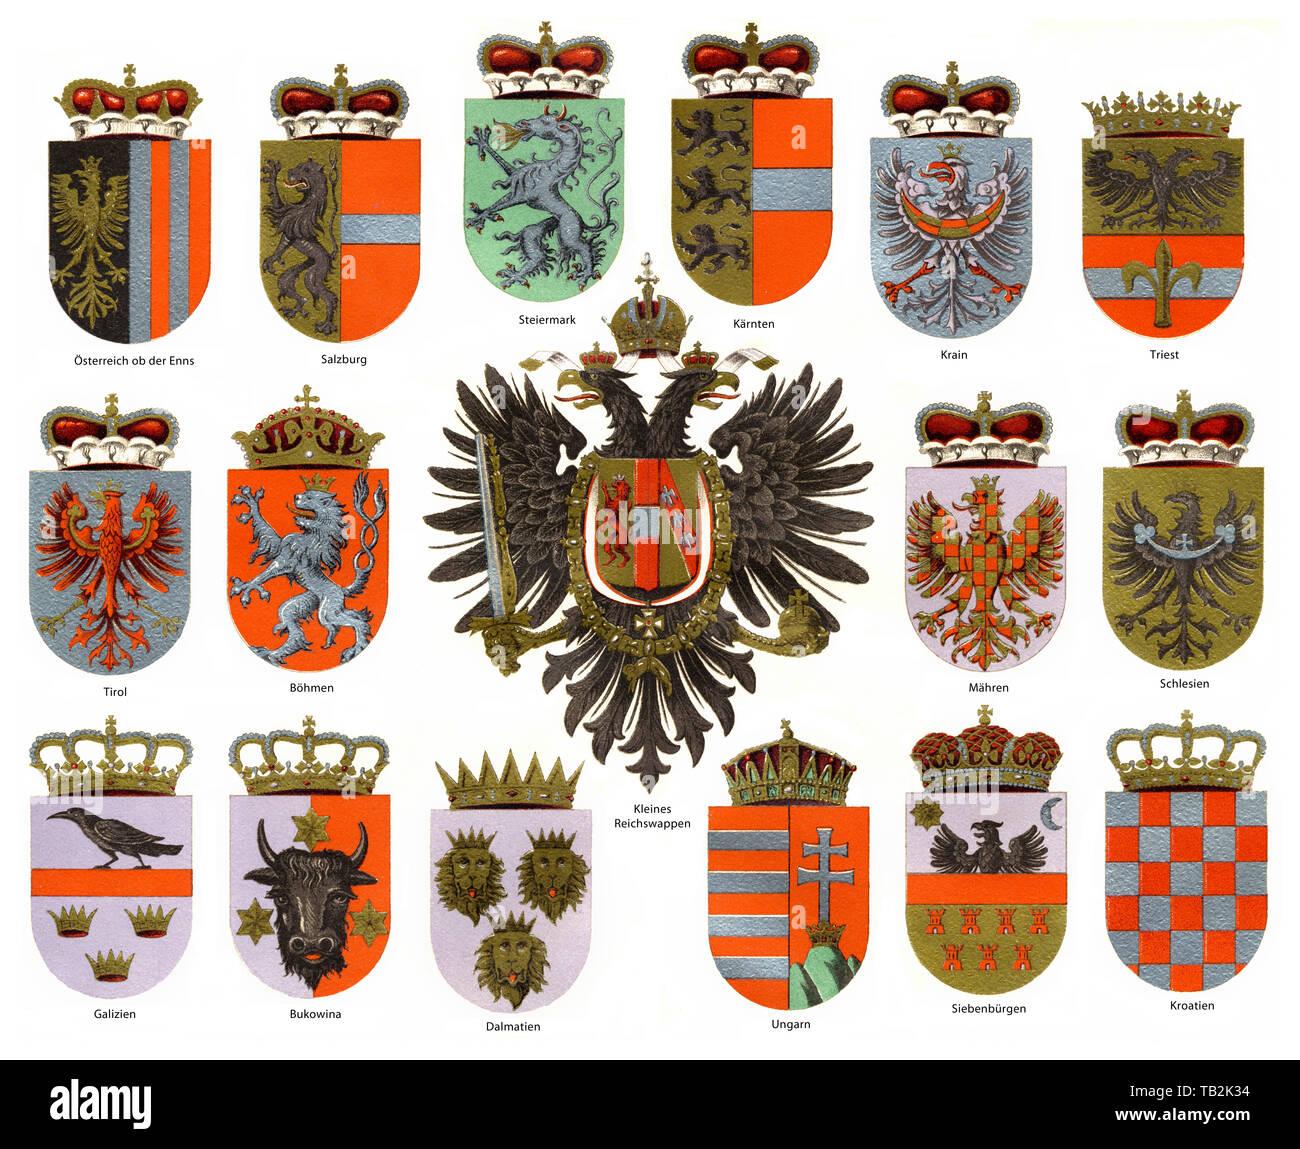 Flags off Austria-Hungary, Austro-Hungarian Empire, Dual Monarchy, 1867-1918 - Stock Image